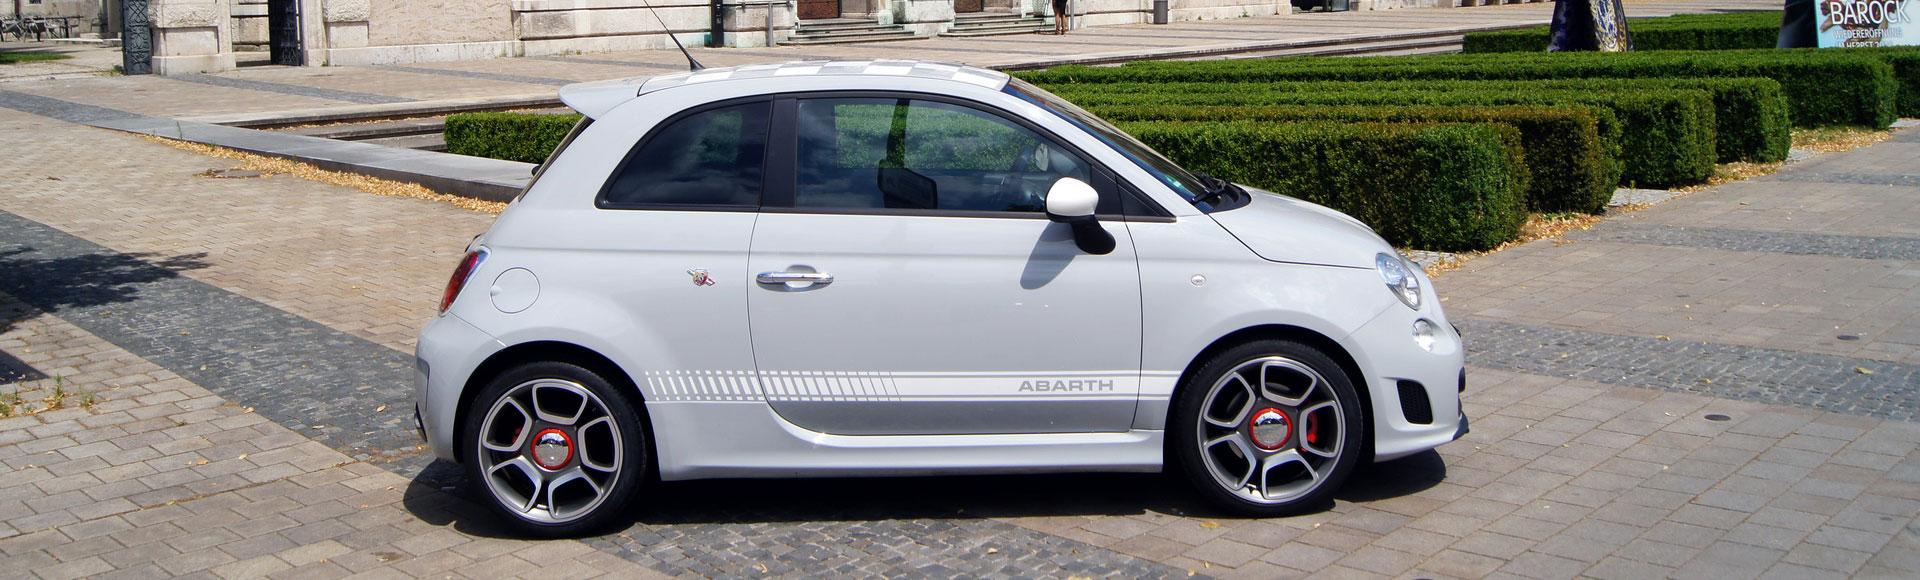 Fiat Abarth 500 2012 Sommer 8076